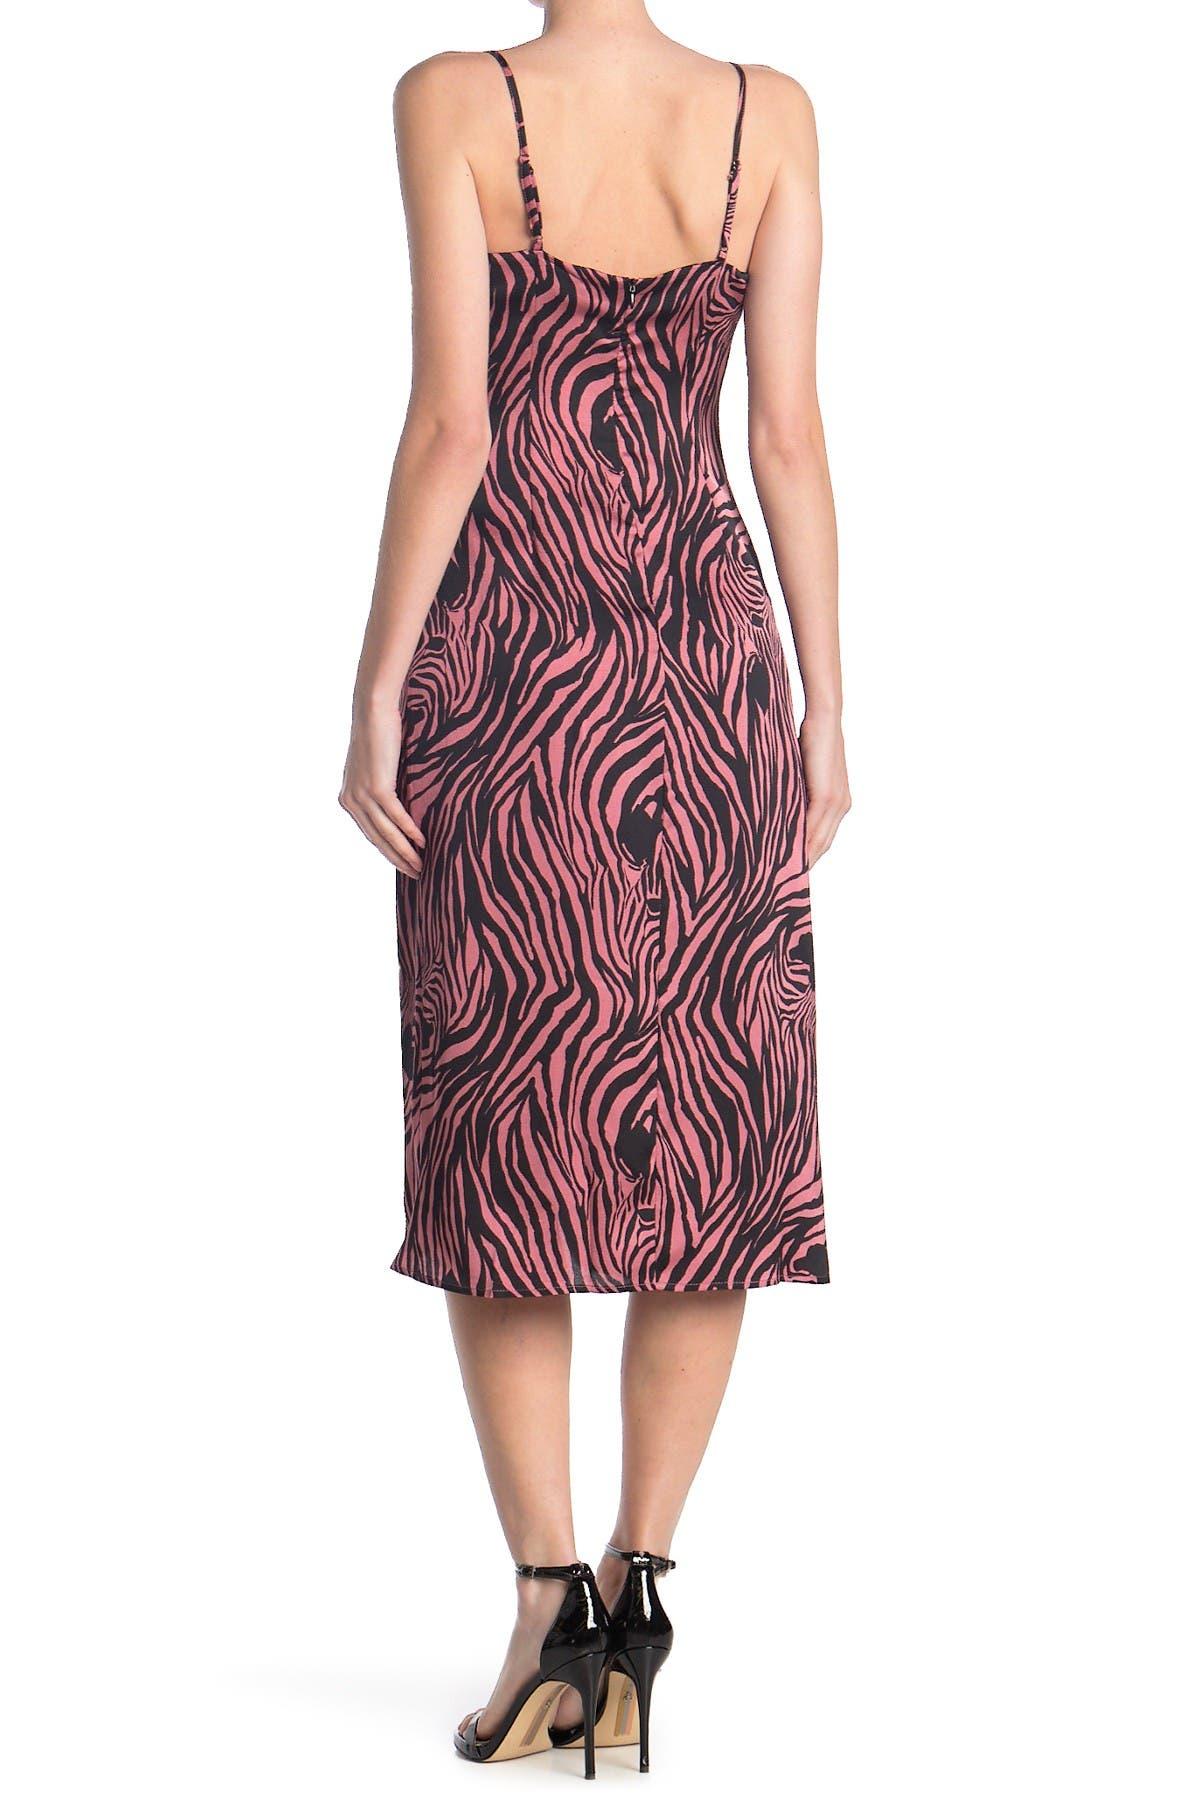 Re:named apparel Pink Zebra Slip Dress